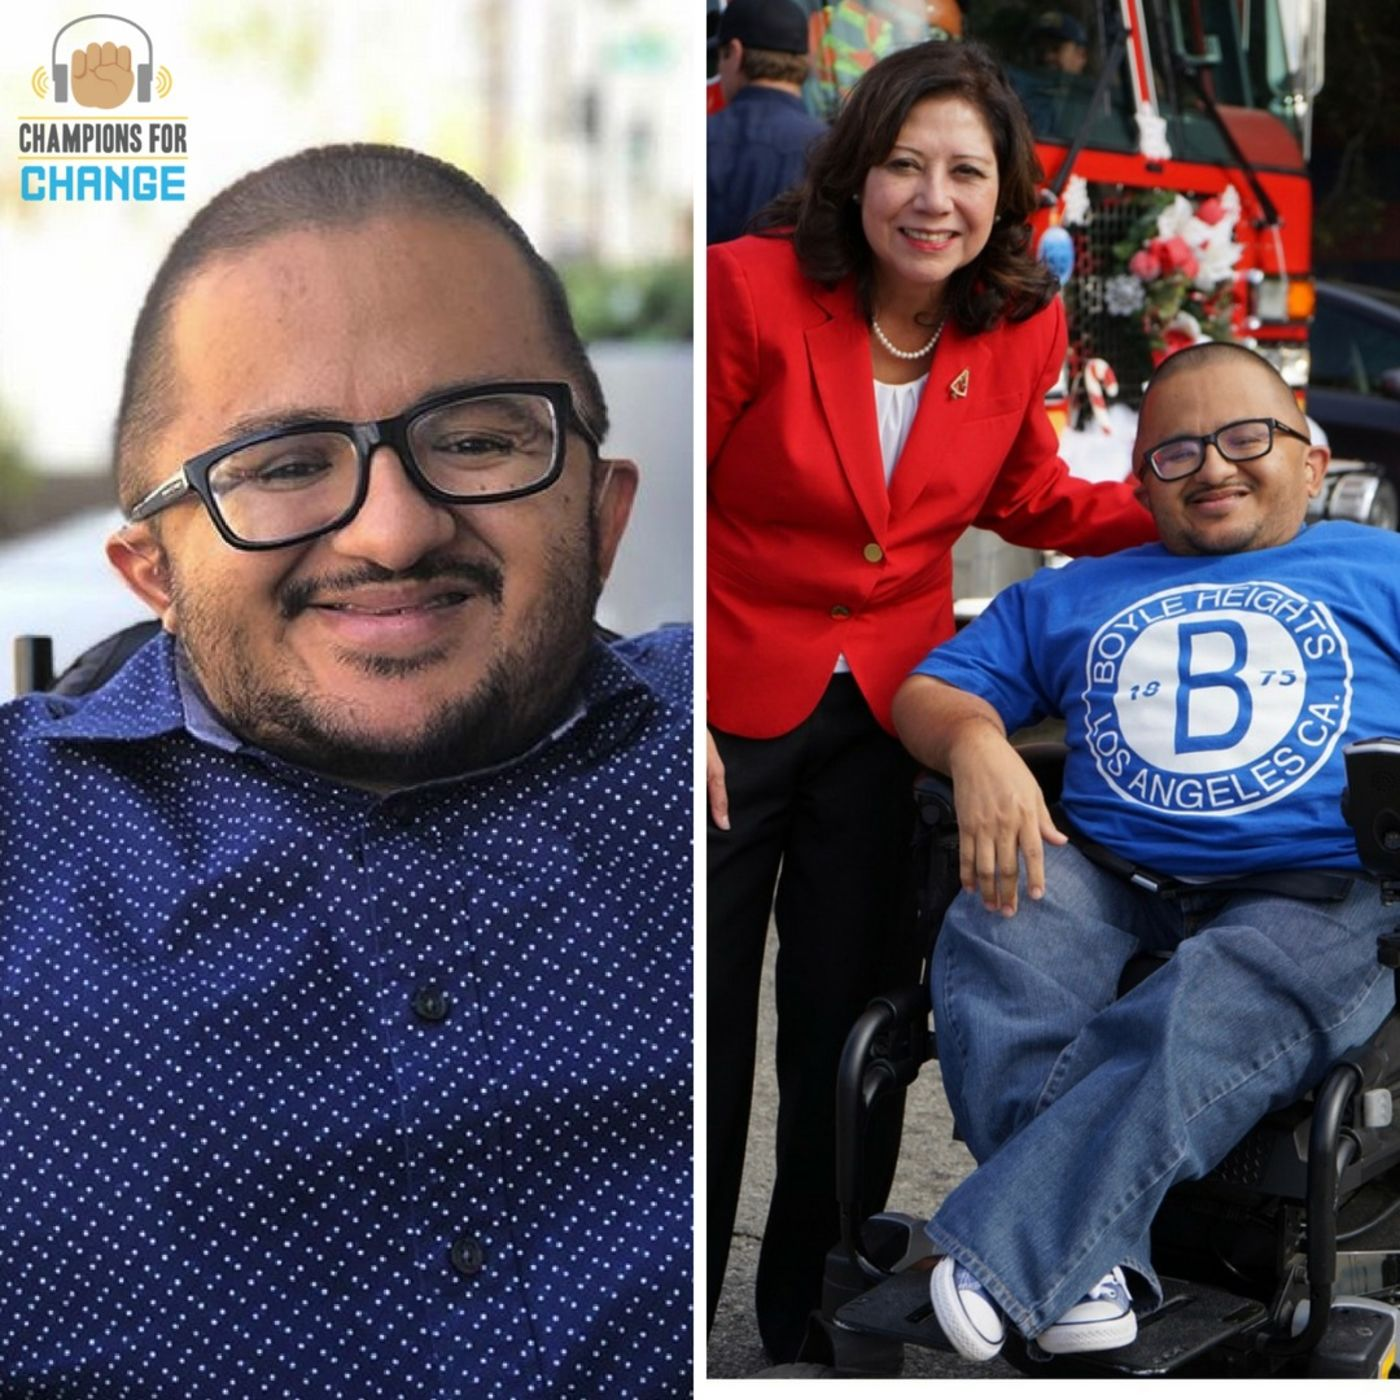 Podcast #3 - Champions for Change - Hector Ochoa